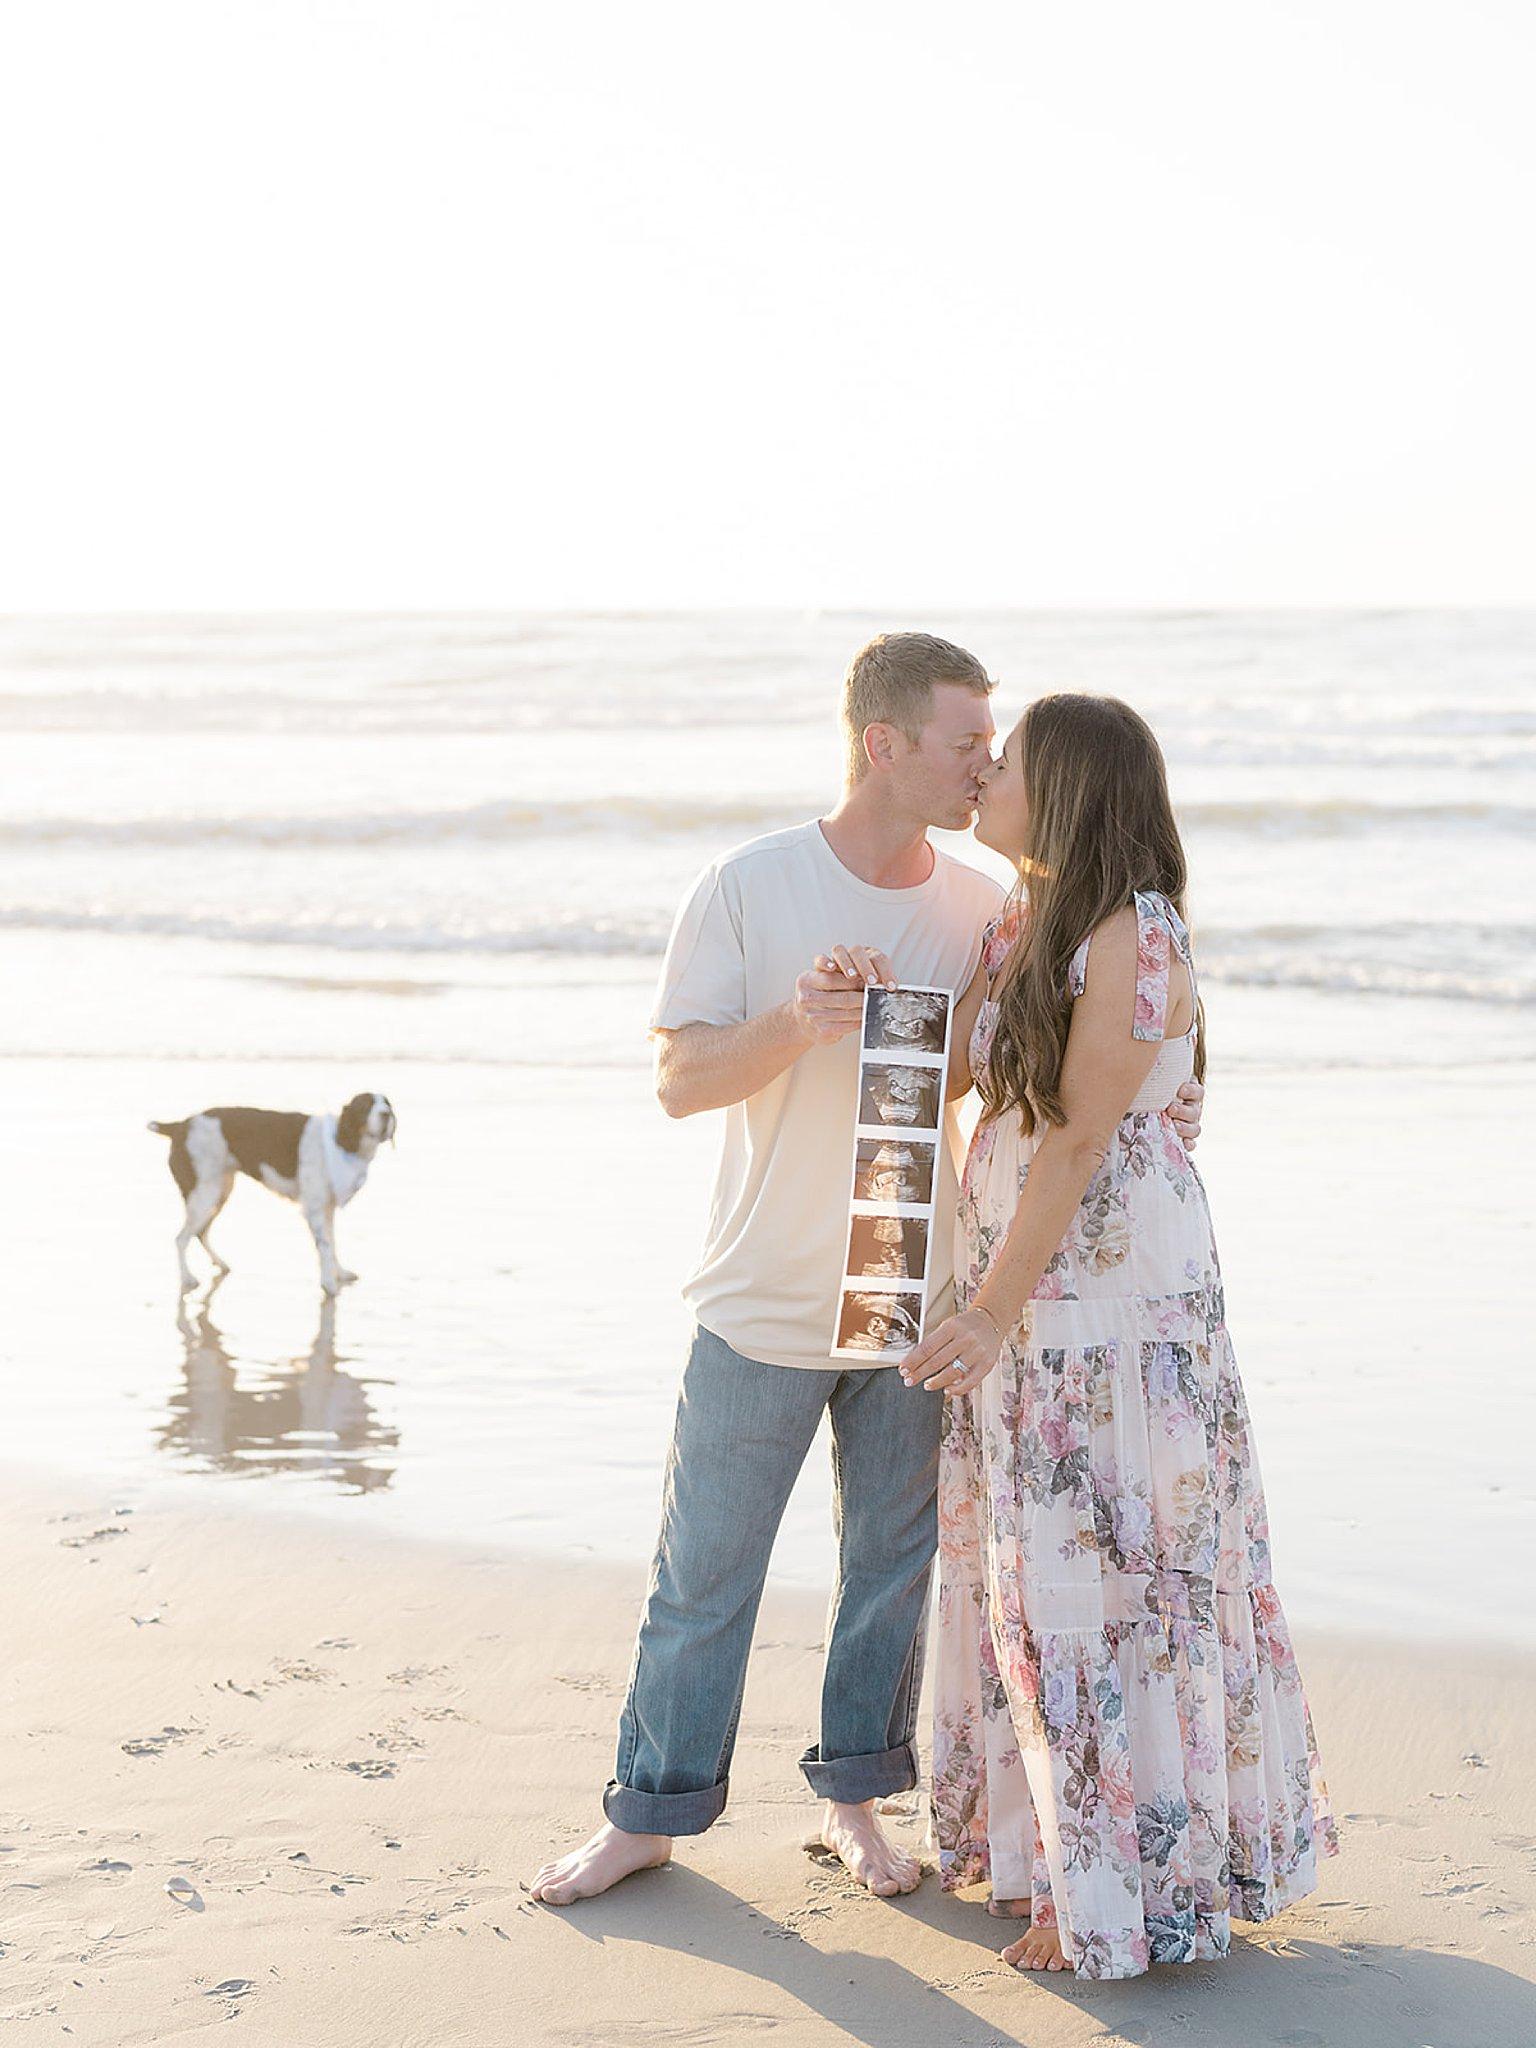 Ocean City NJ Gender Reveal Pregnancy Photography by Magdalena Studios 0025